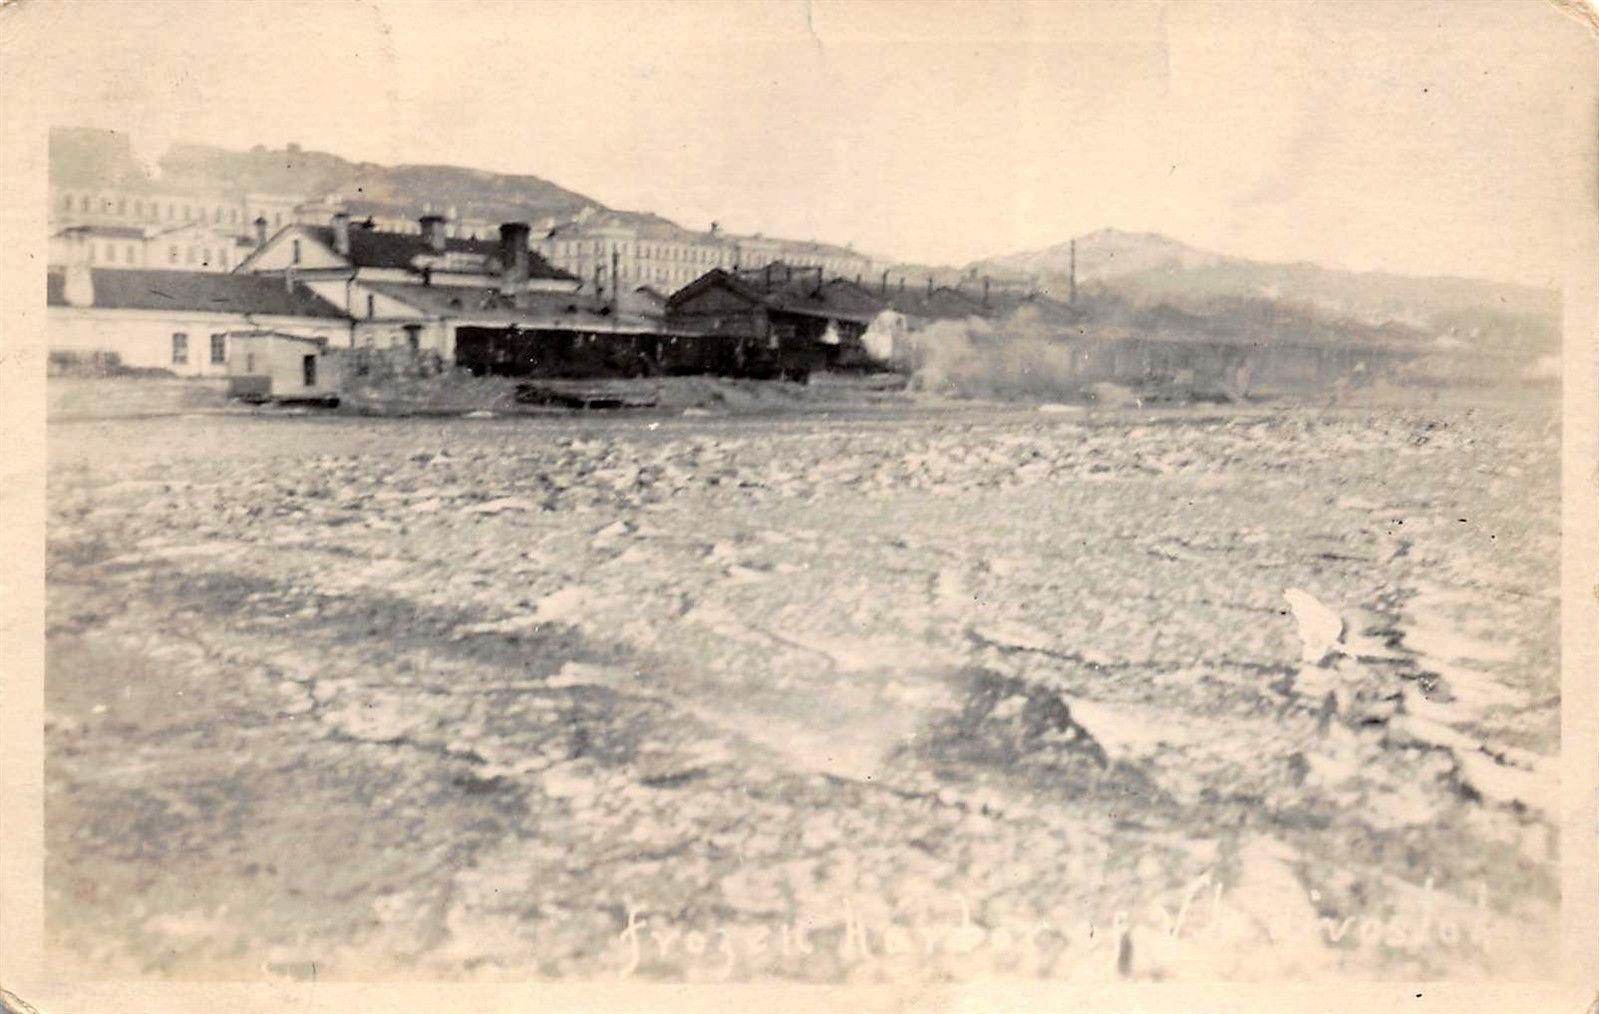 Замёрзший залив возле Экипажной пристани